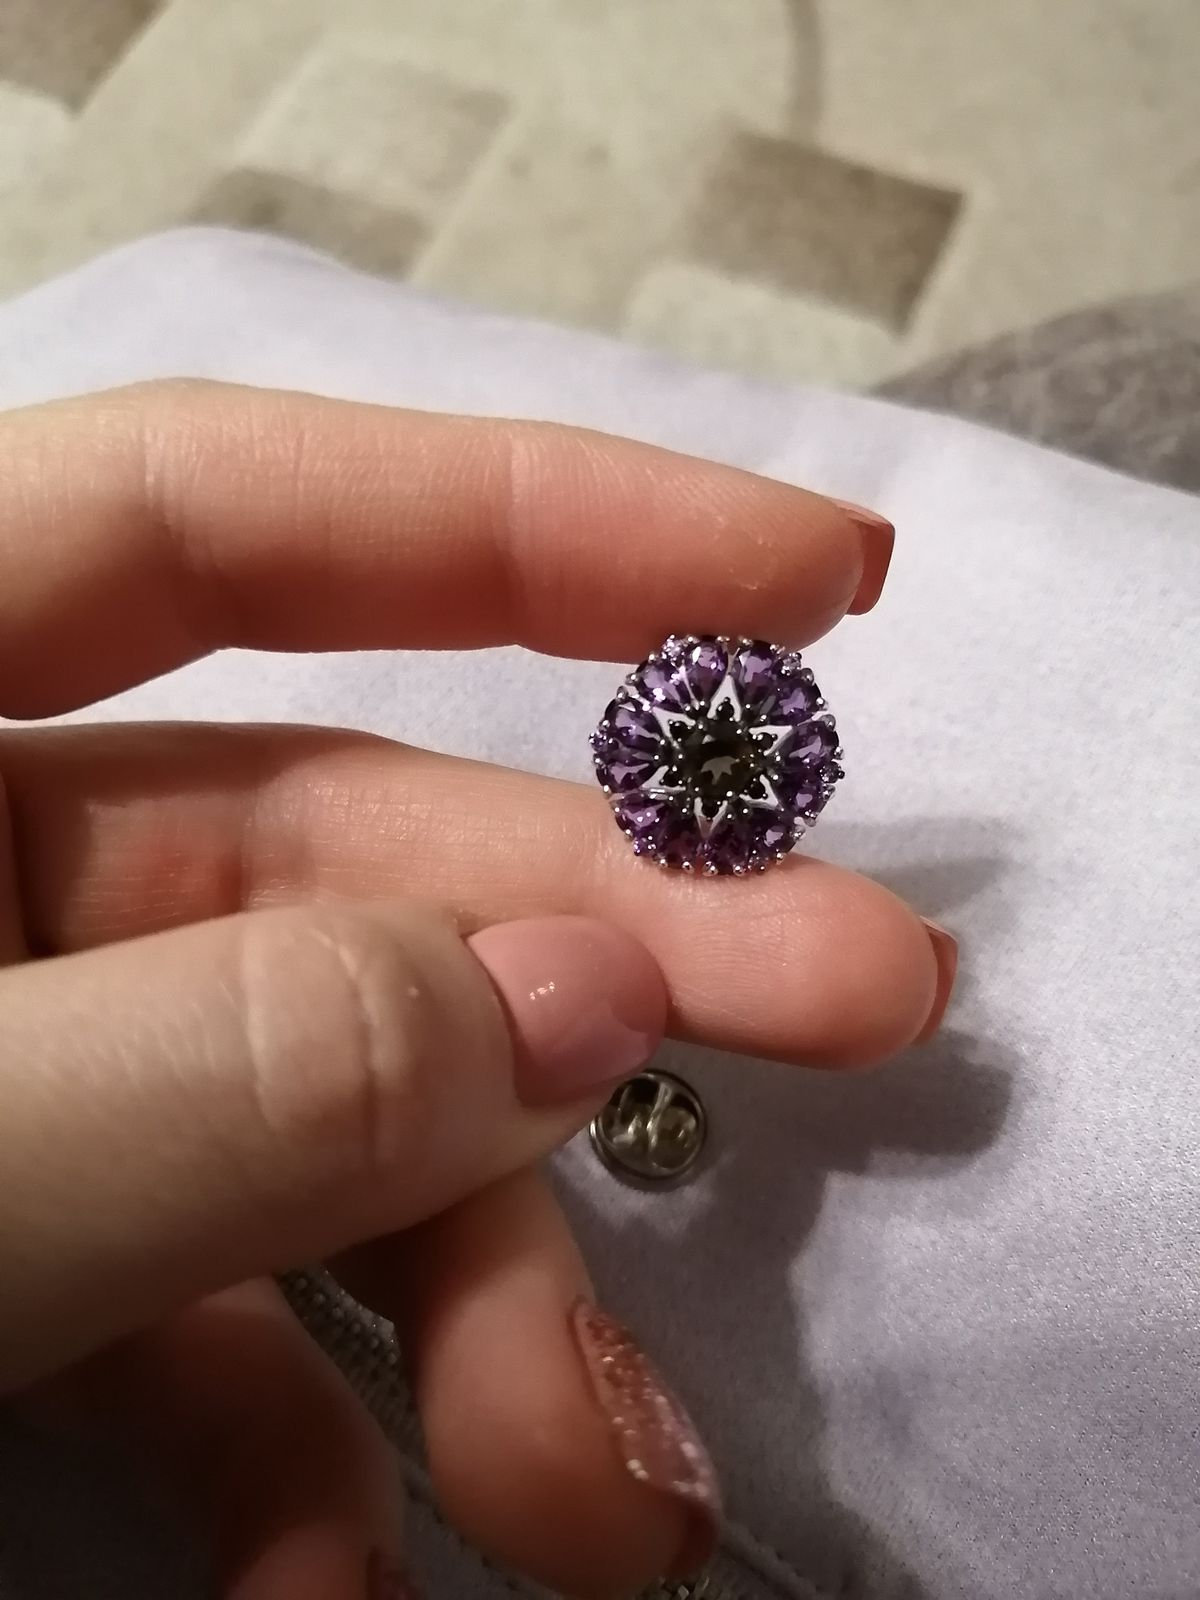 Василечек цветочек